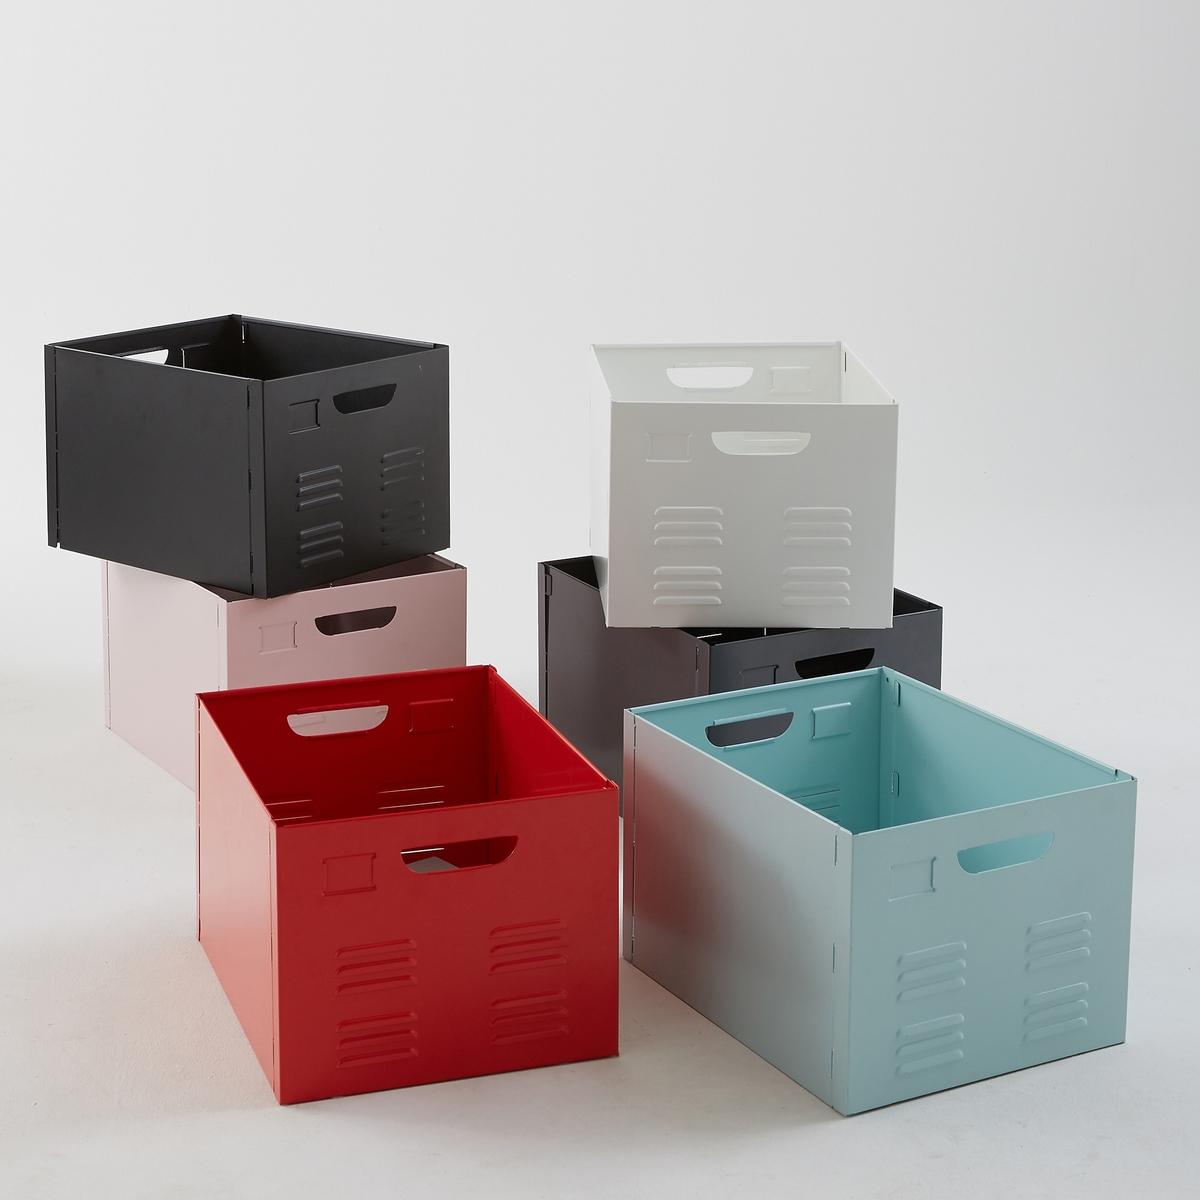 Ящик металлический, HIBA edo косметика ящик для хранения ящик для хранения пластиковых шкафов для хранения ящик для хранения тетрадей th1158 blue